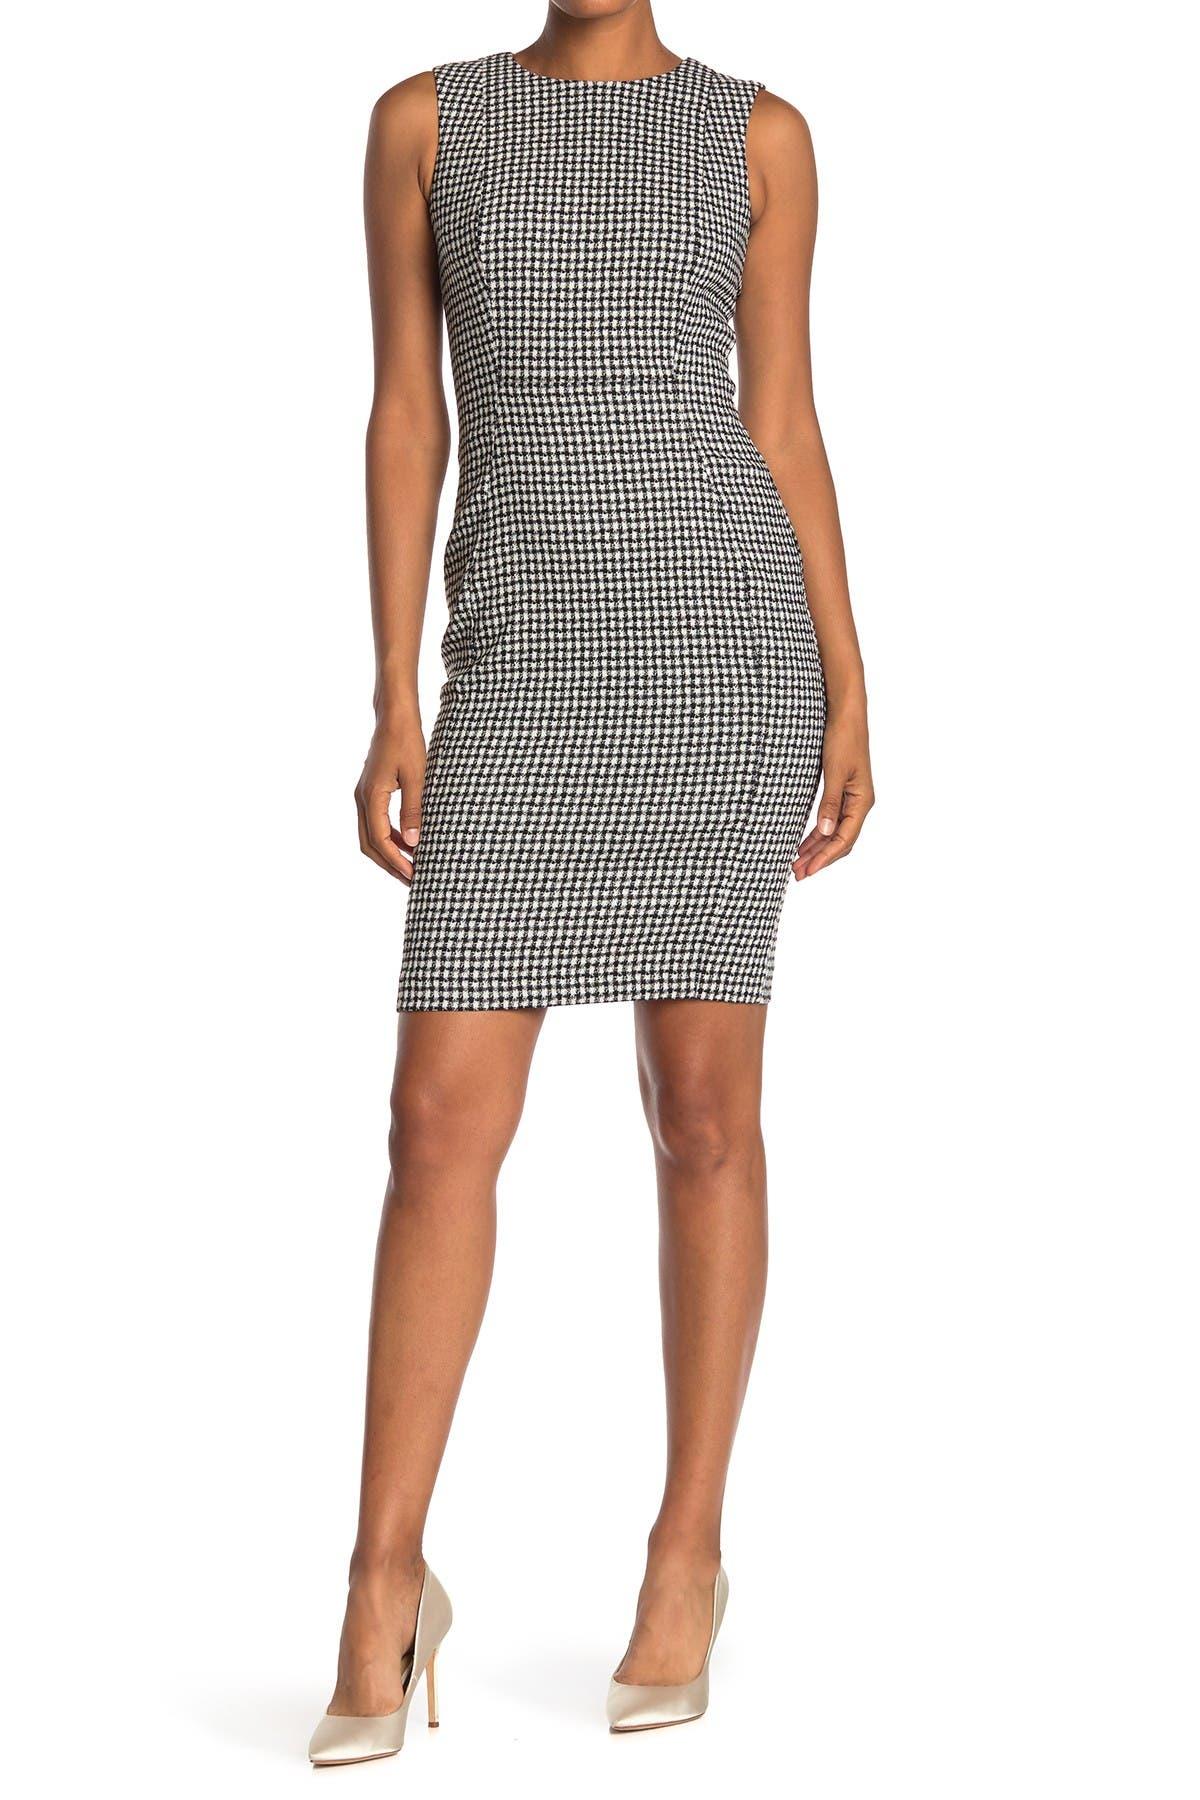 Image of Calvin Klein Check Print Sleeveless Sheath Dress